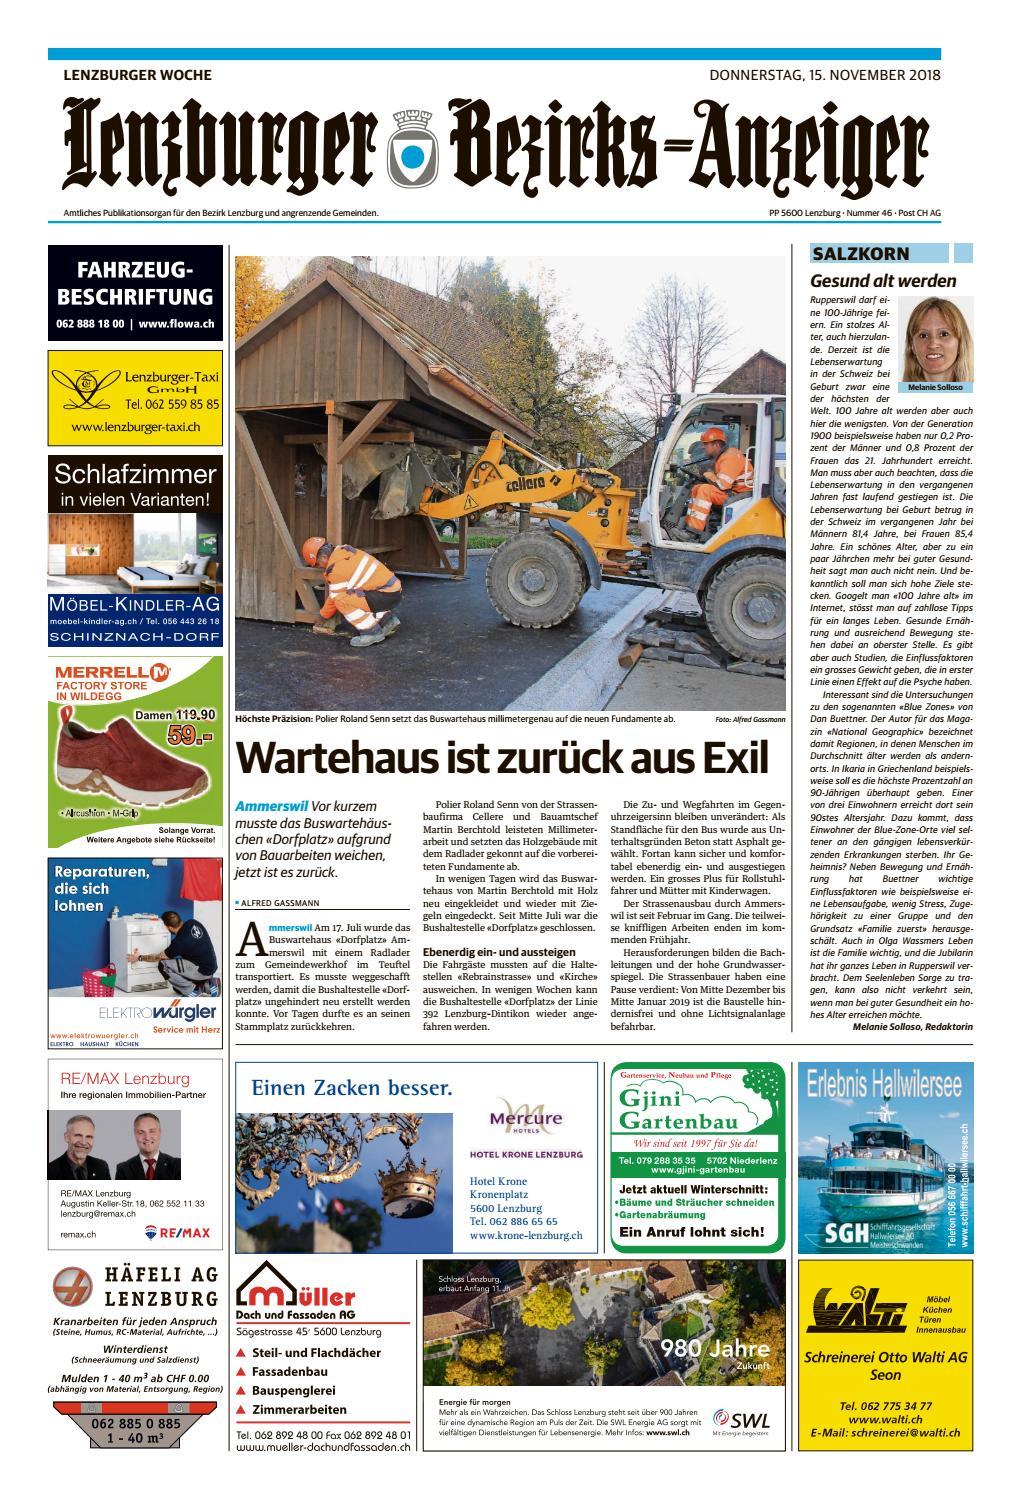 Bs Meine Stadt Single Mogelsberg Online Partnersuche Sevelen